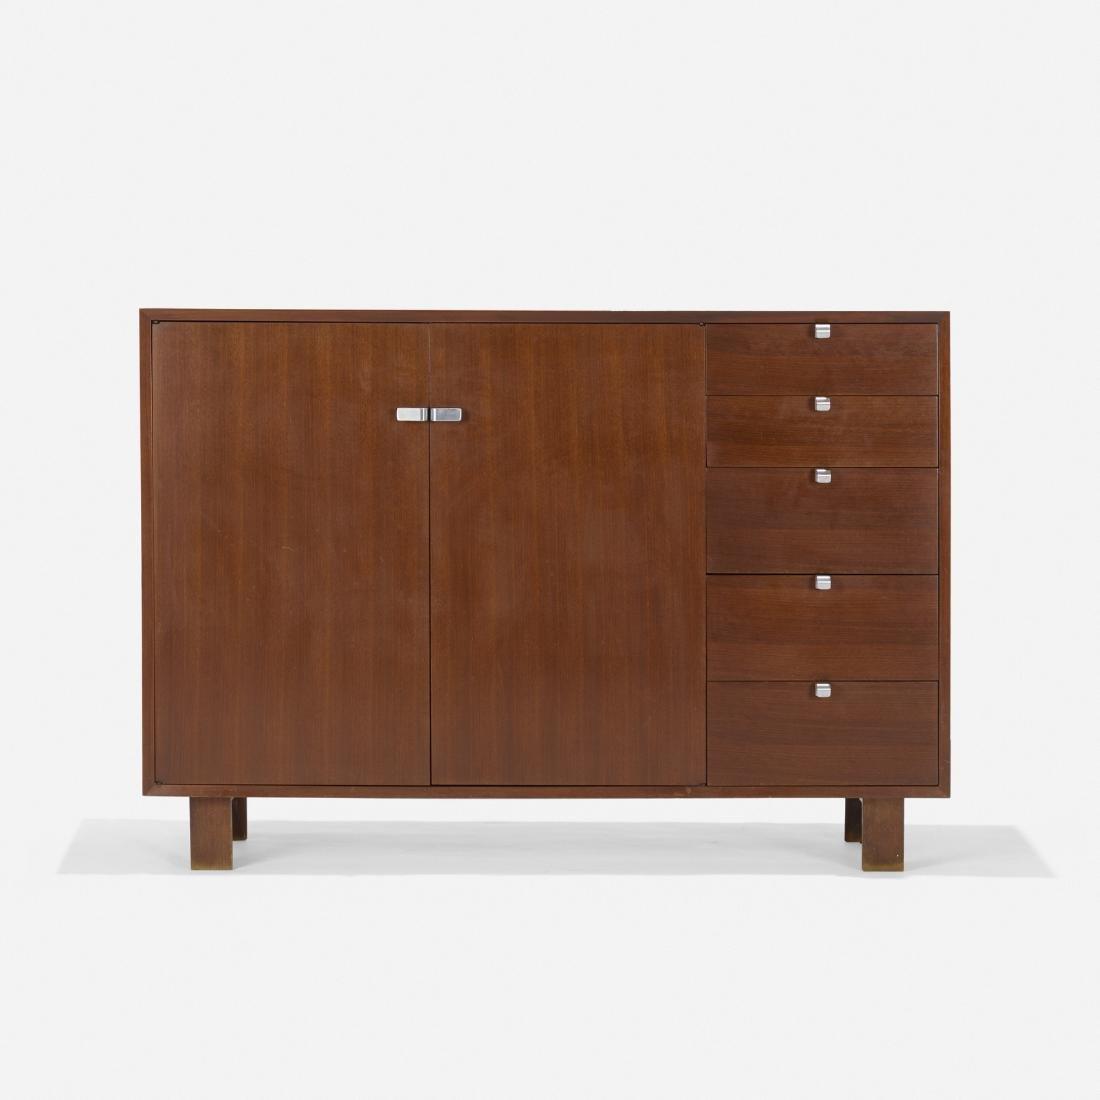 George Nelson & Associates, cabinet, model 4937